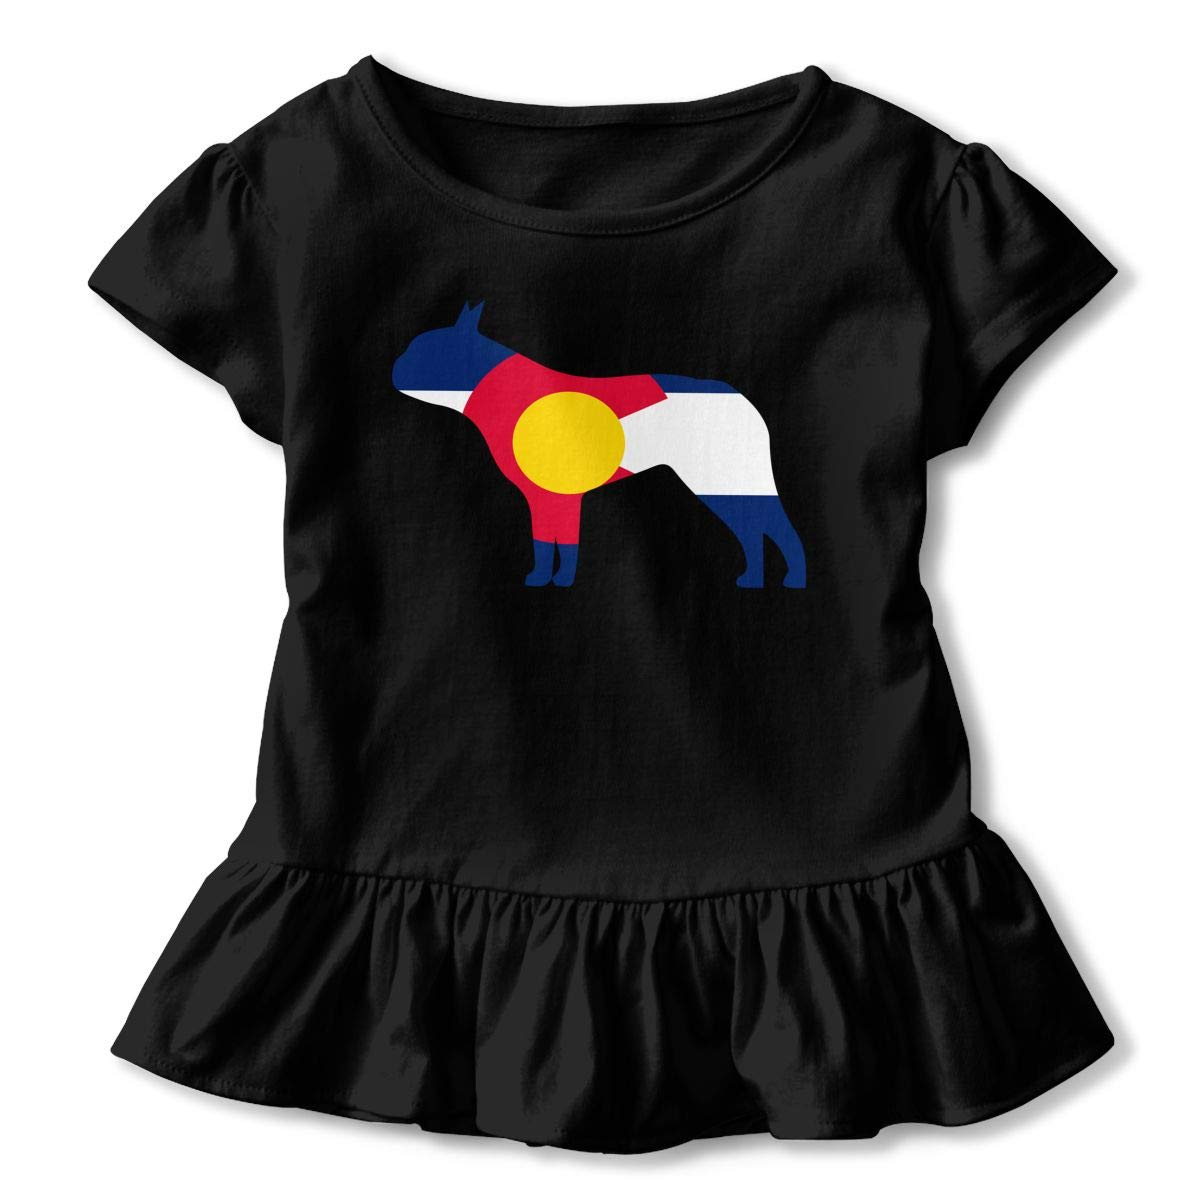 Clarissa Bertha Boston Terrier Dog Colorado Flag Toddler Baby Girls Short Sleeve Ruffle T-Shirt